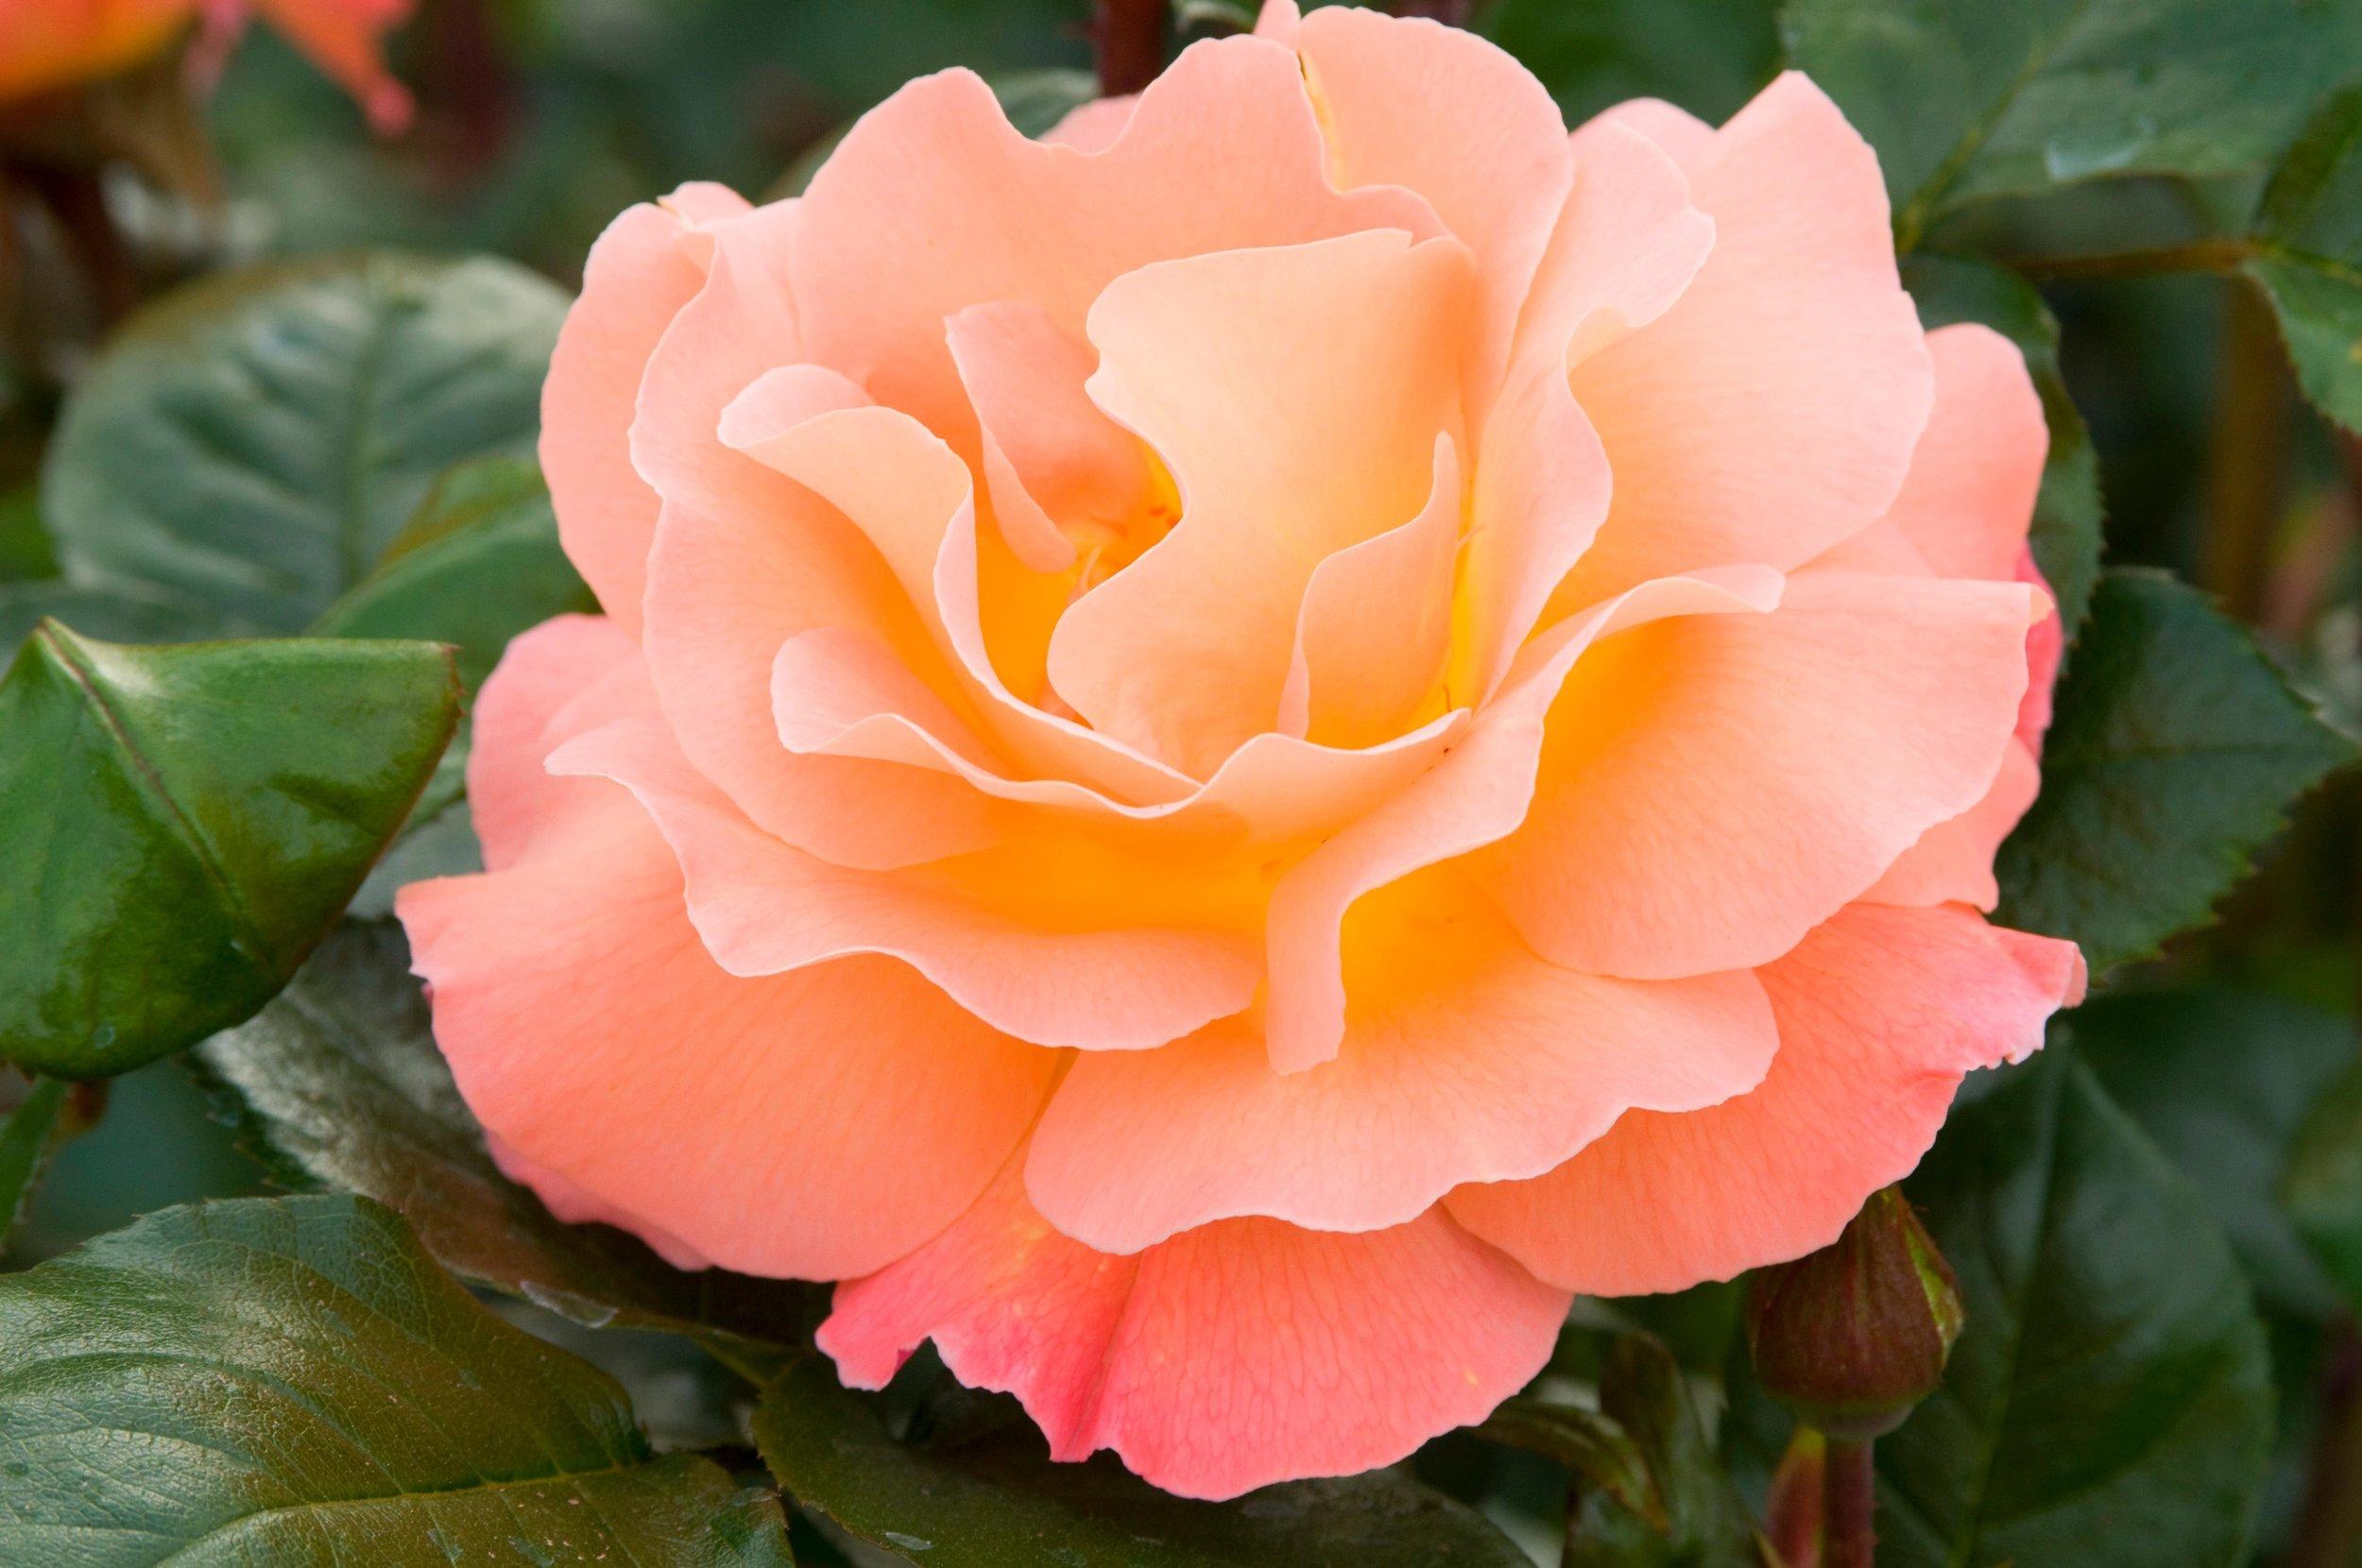 Rose 'Rosemary Harkness'